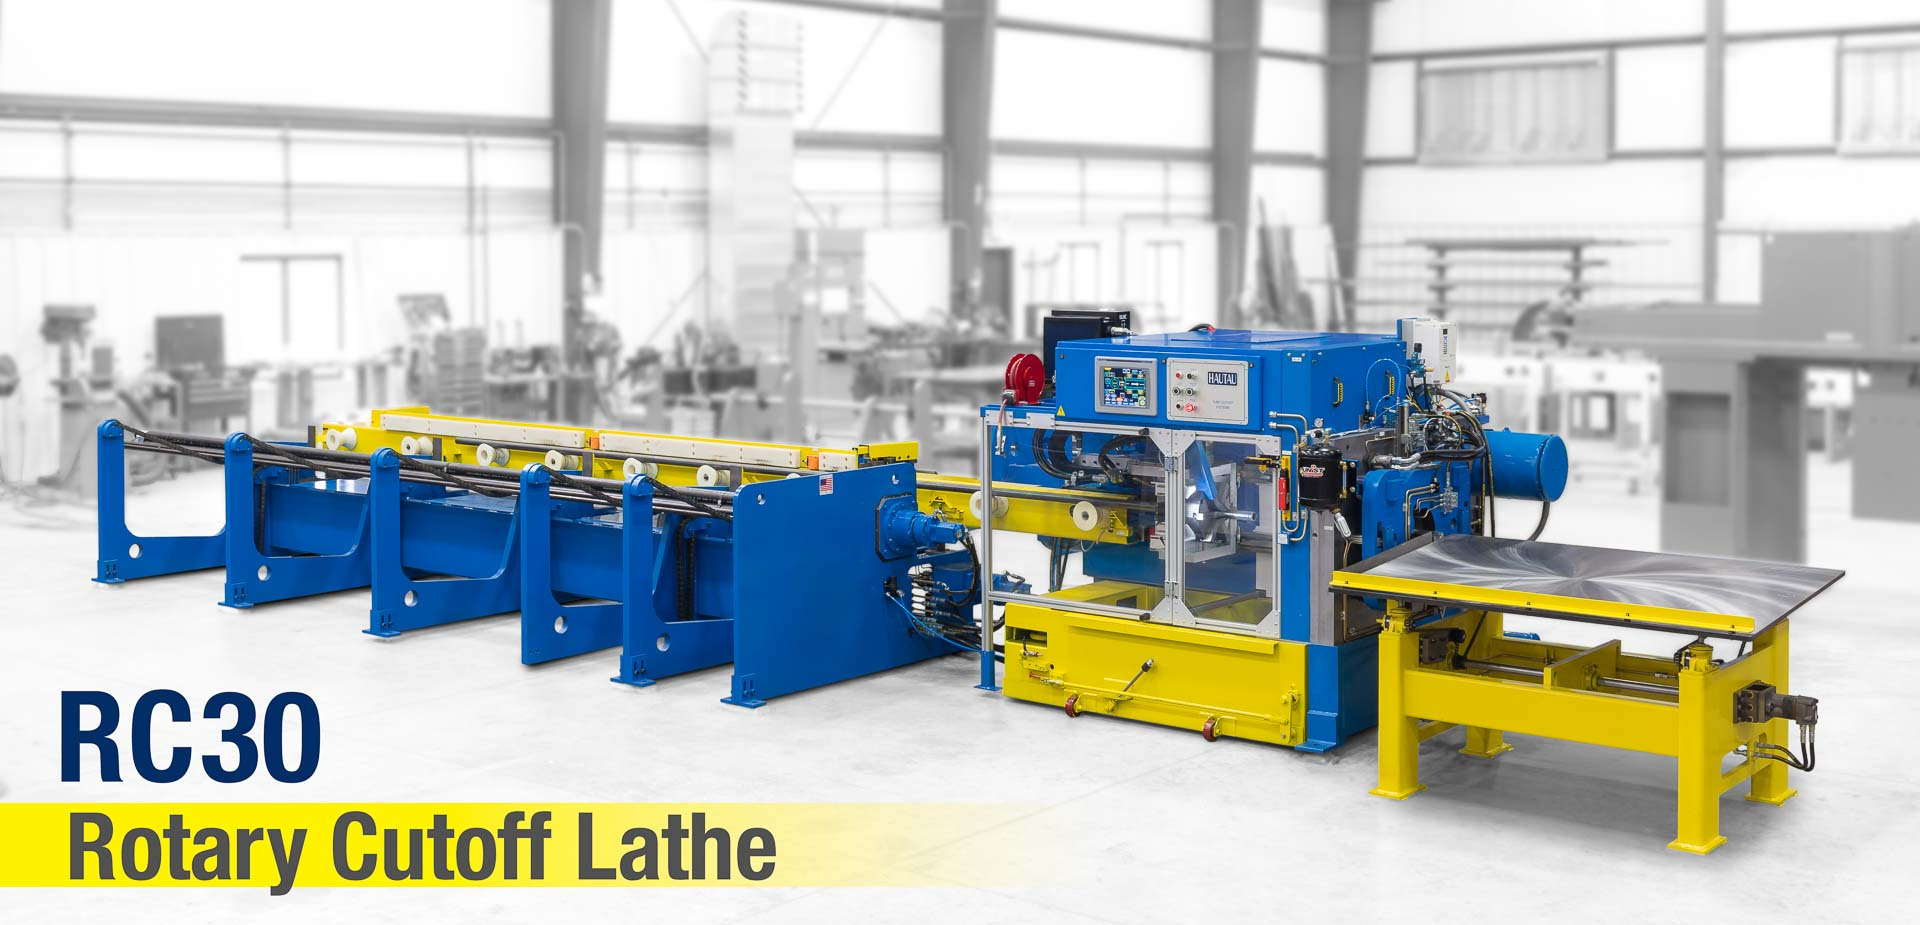 Pipe-Cutoff-Lathe-System